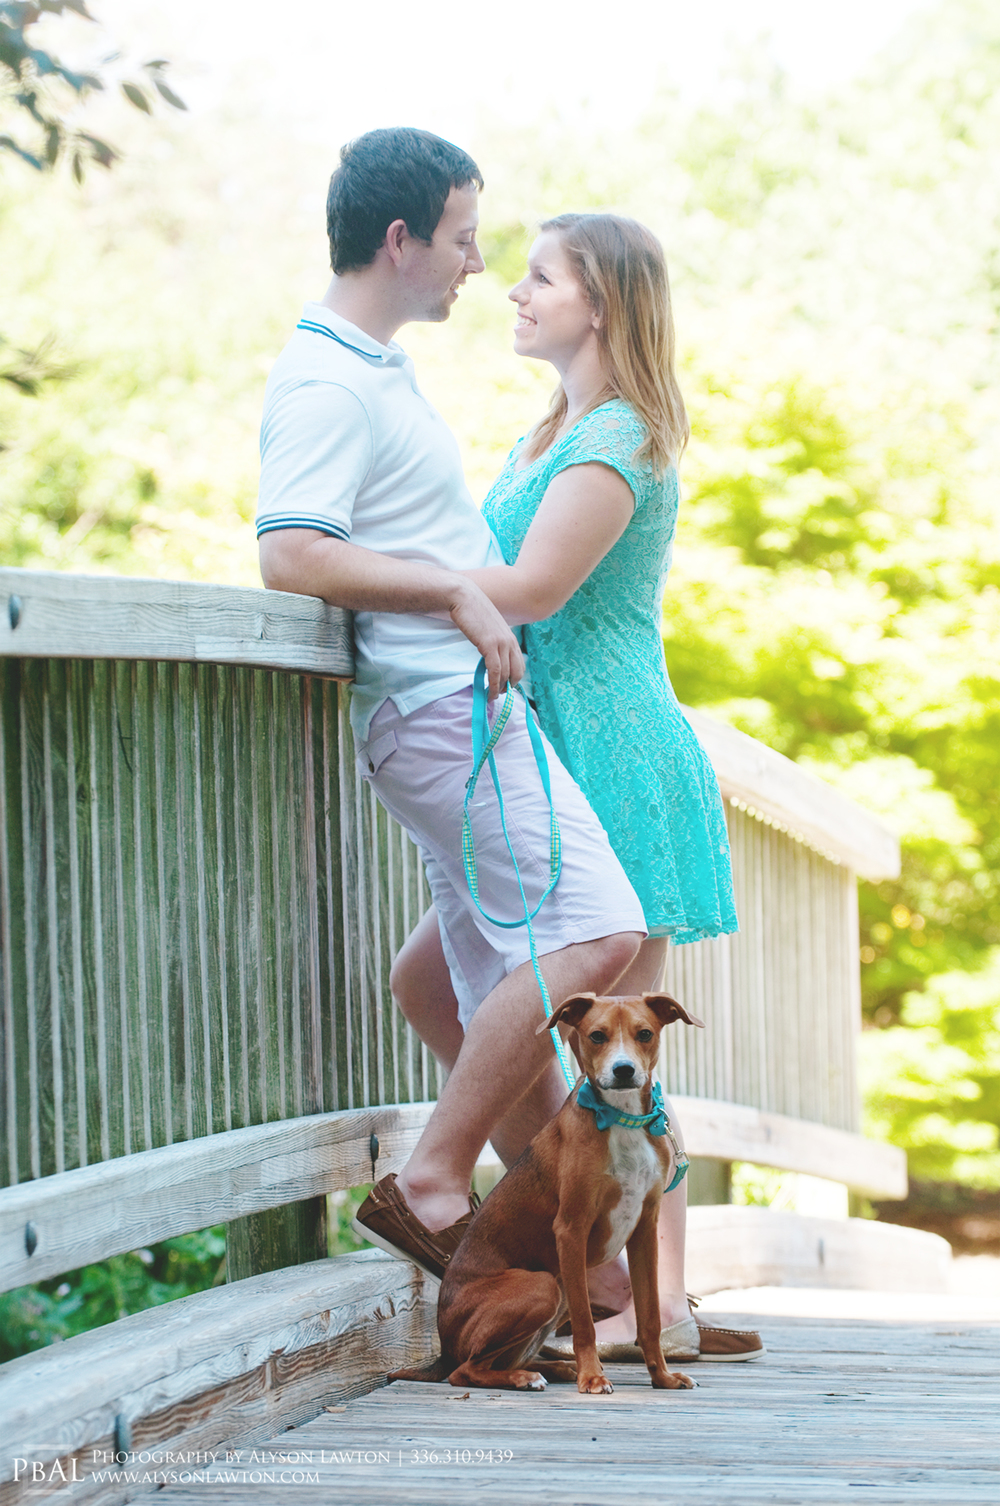 { North Carolina Portrait Photographer | Rachel & Ethan| High Point University | Greensboro, NC | Photography by Alyson Lawton }